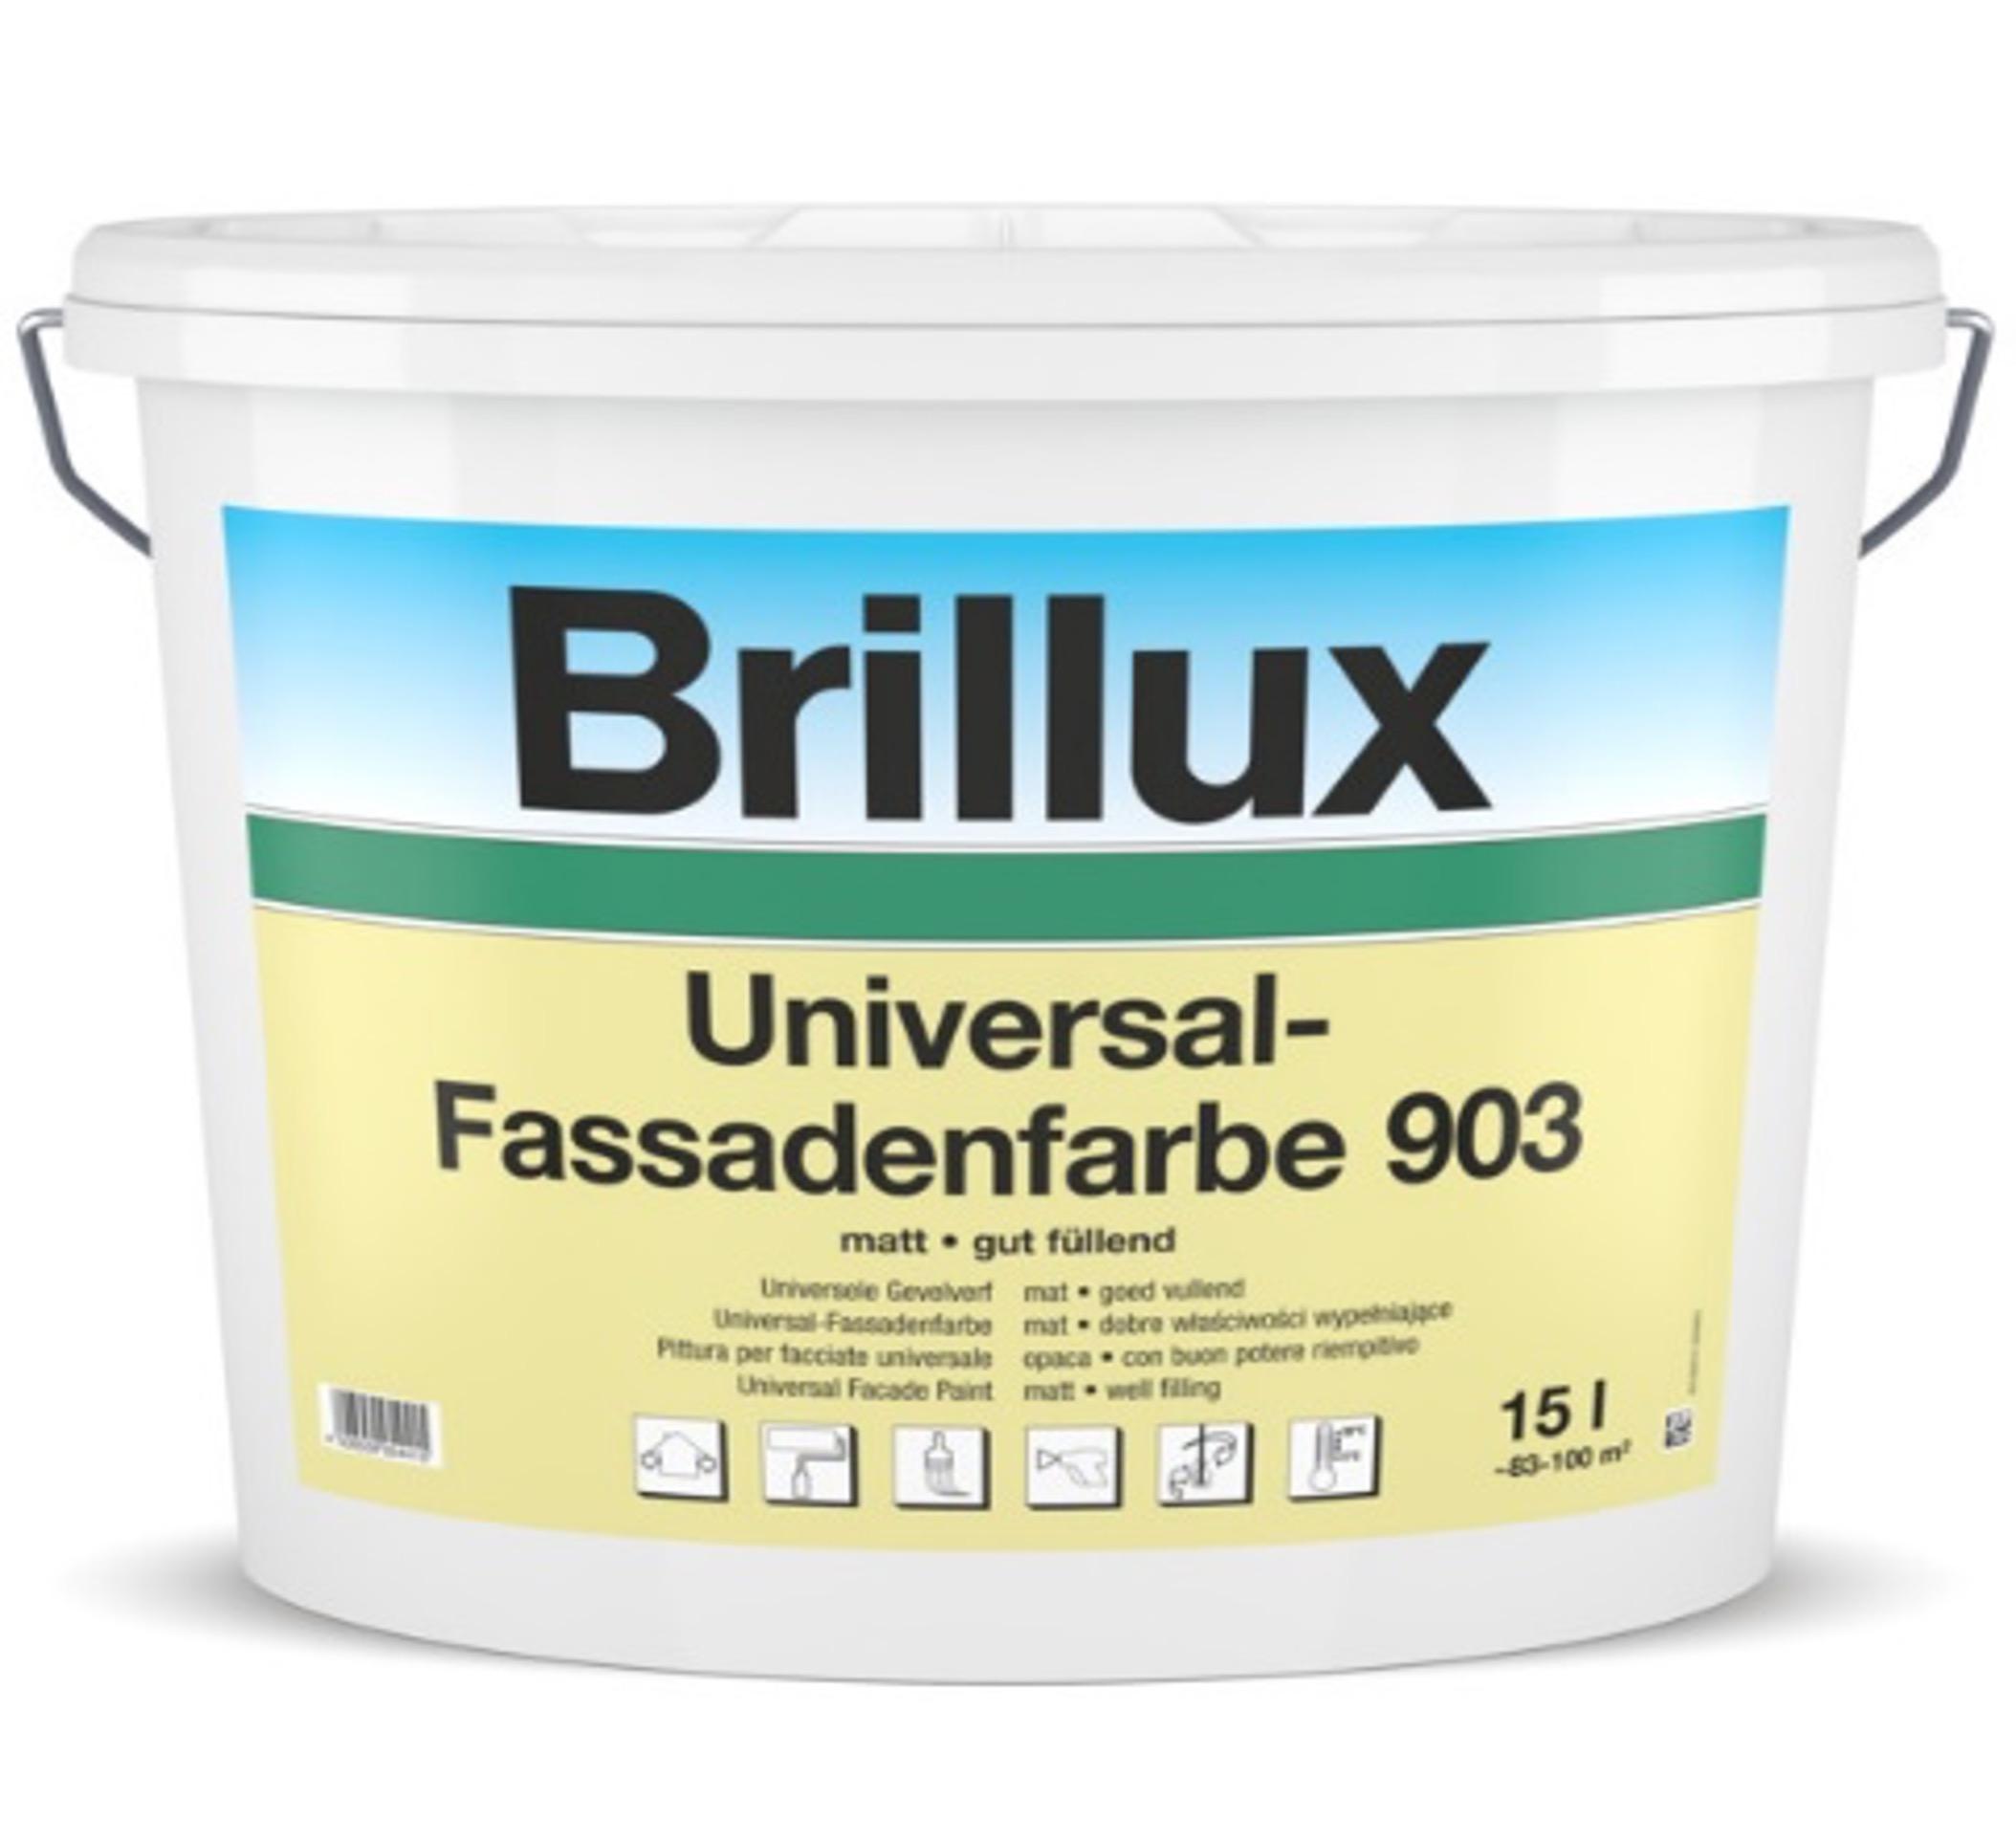 Brillux Universal Fassadenfarbe 903 Fassadenfarbe Image